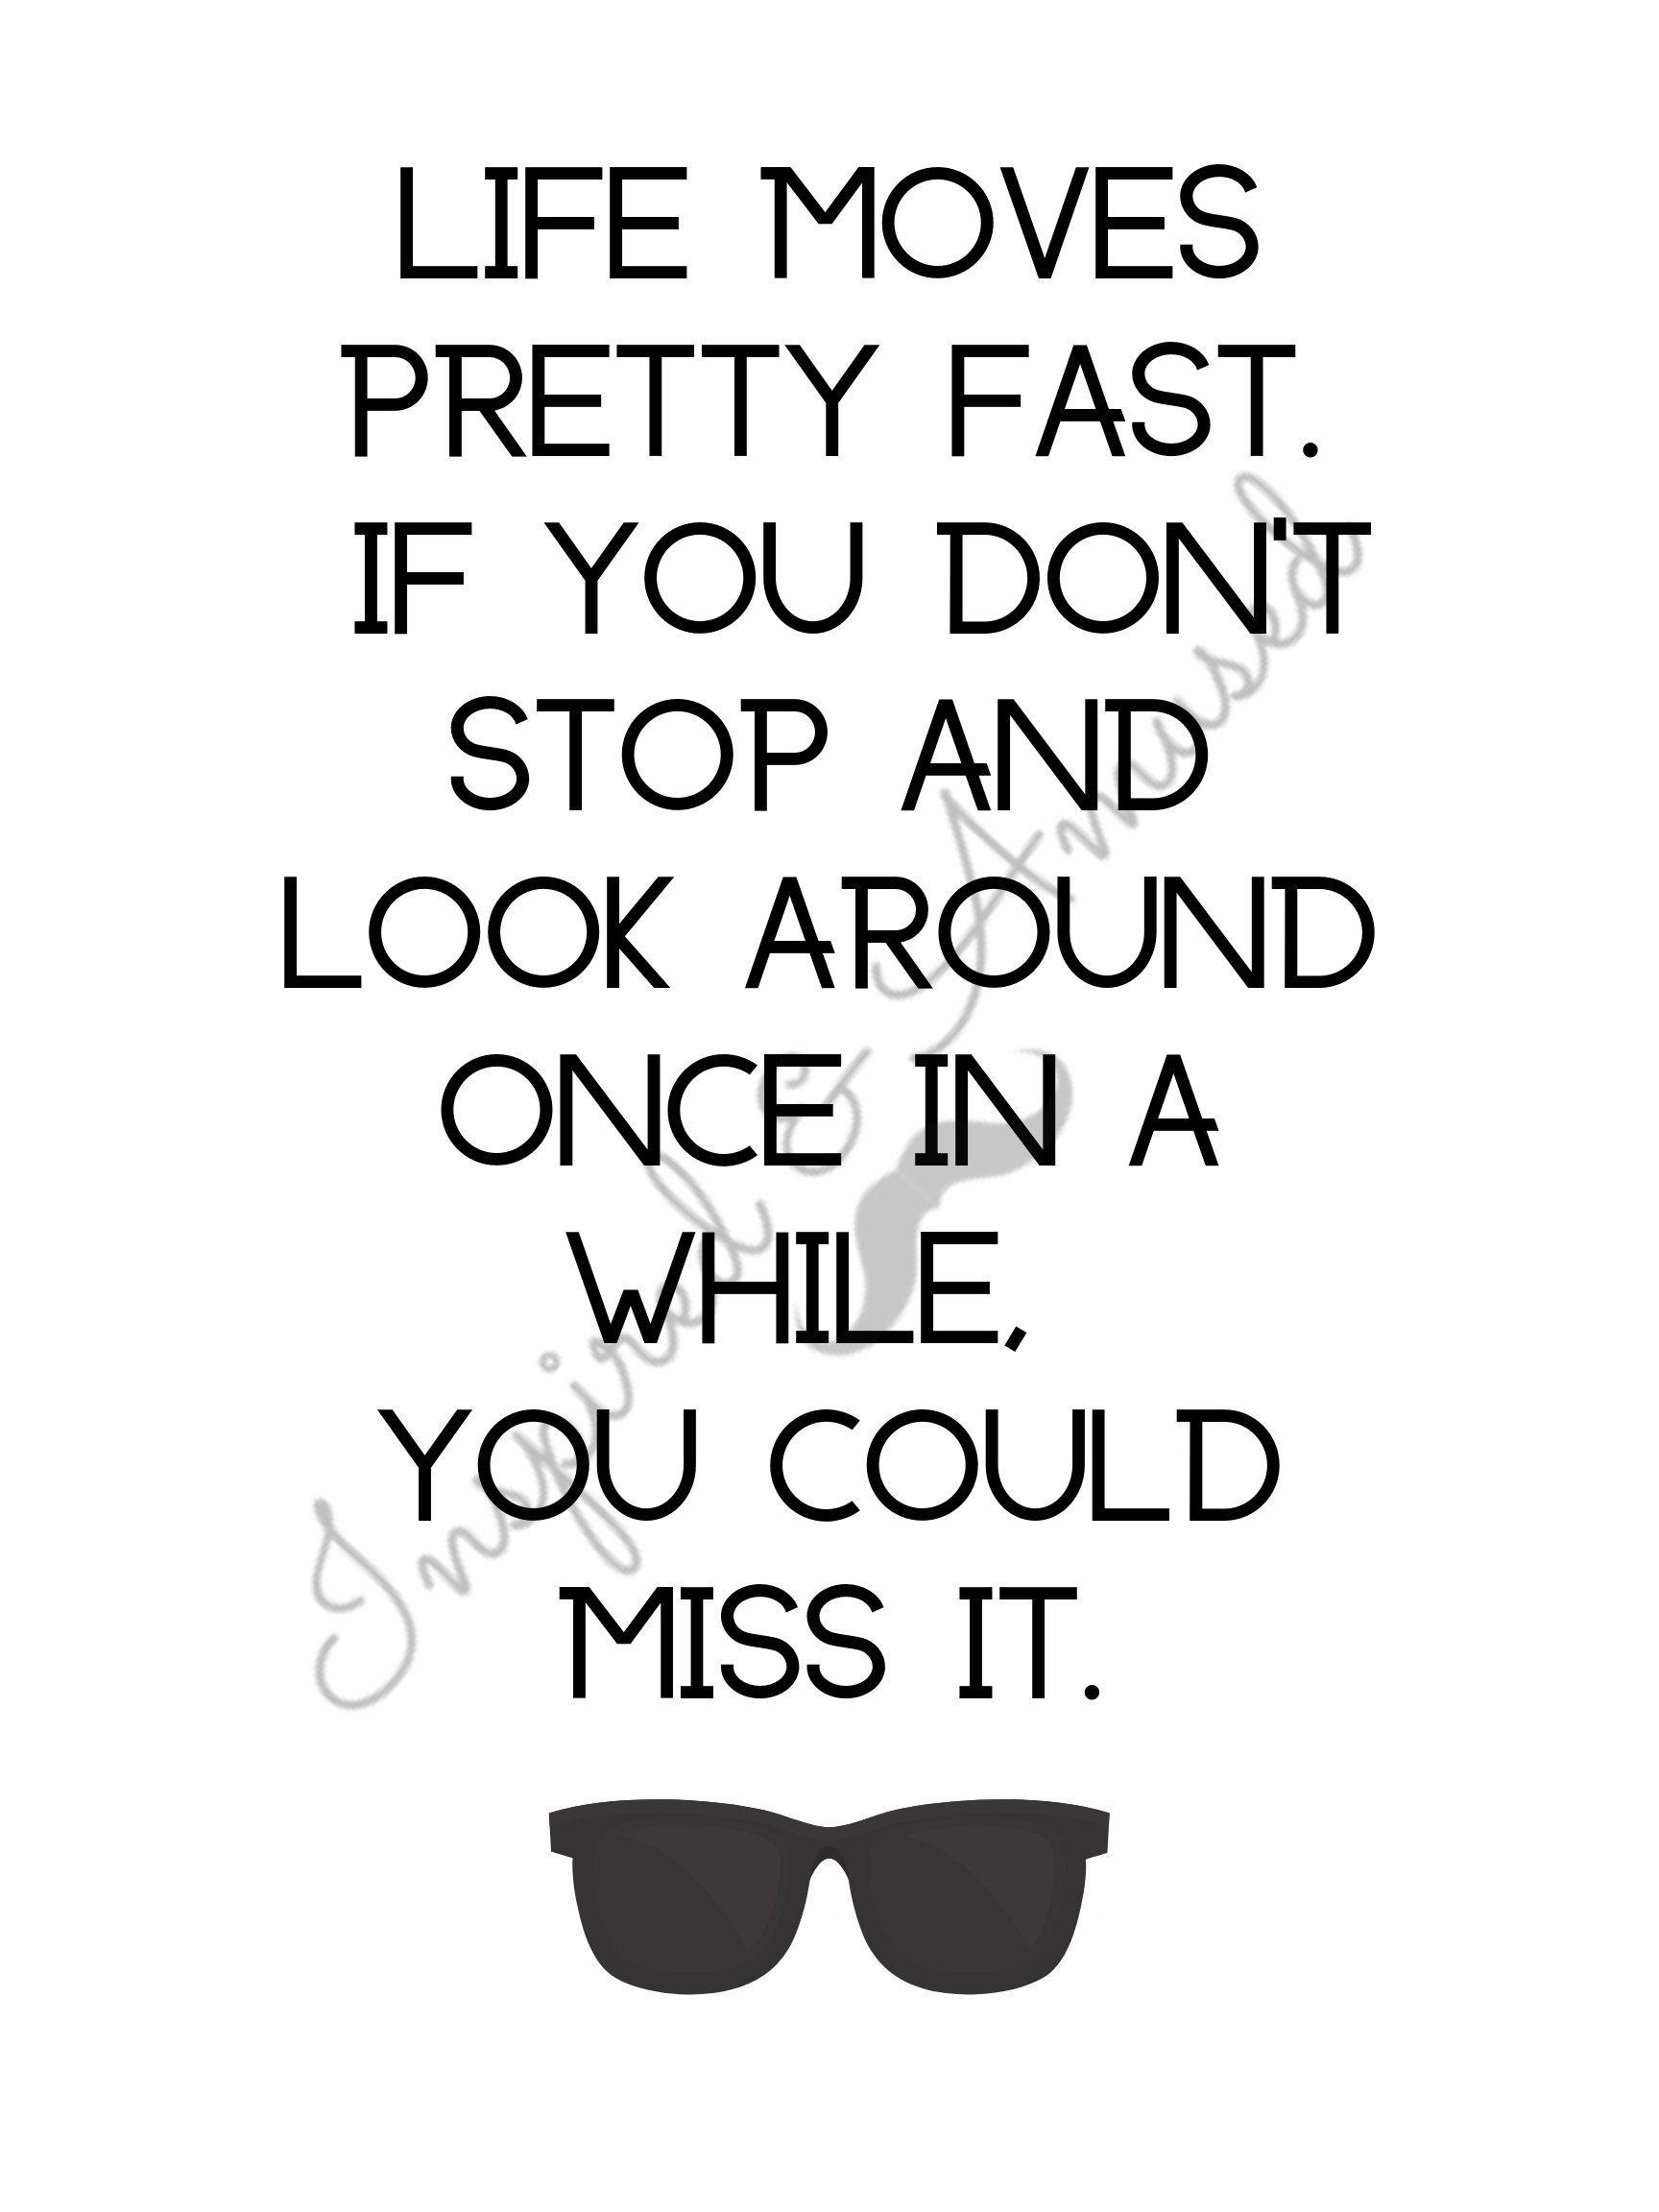 Ferris Bueller quoteLife moves pretty fastInspirational